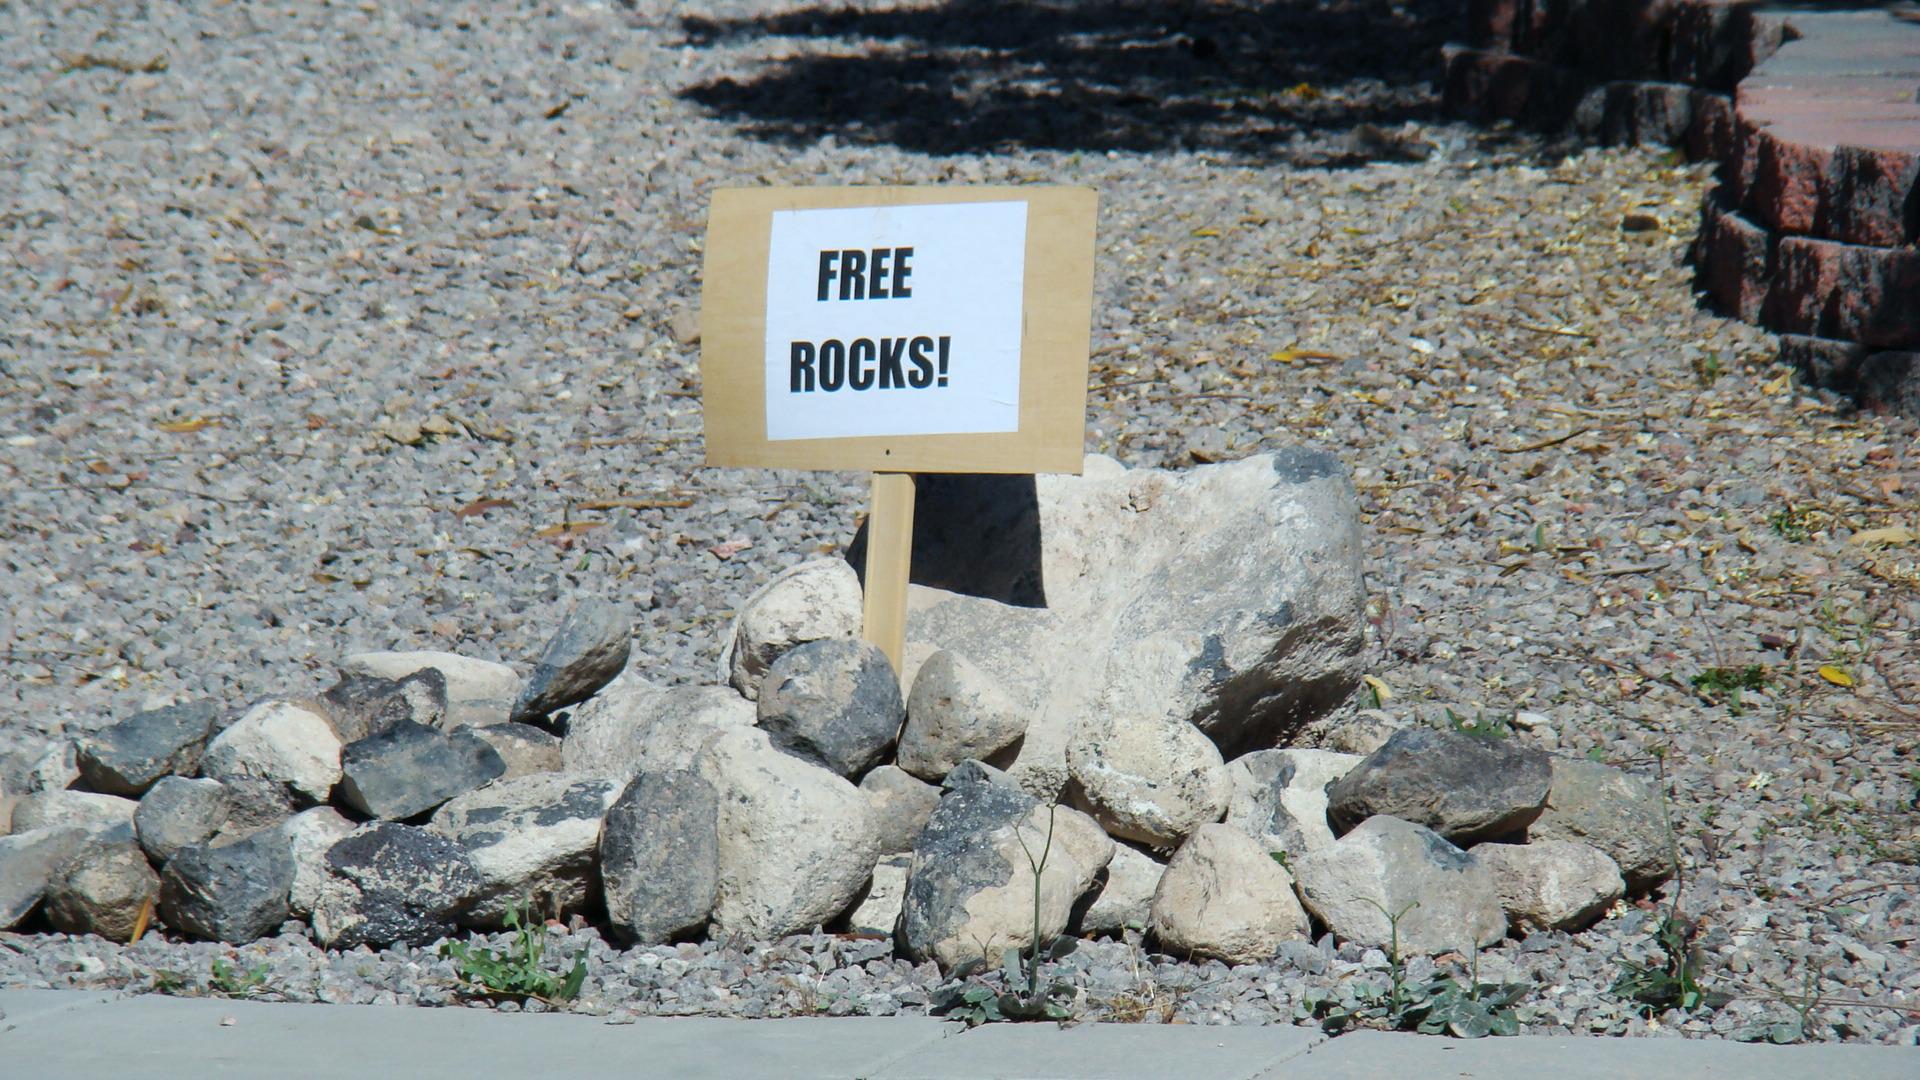 mayjune2011-001-free-rocks